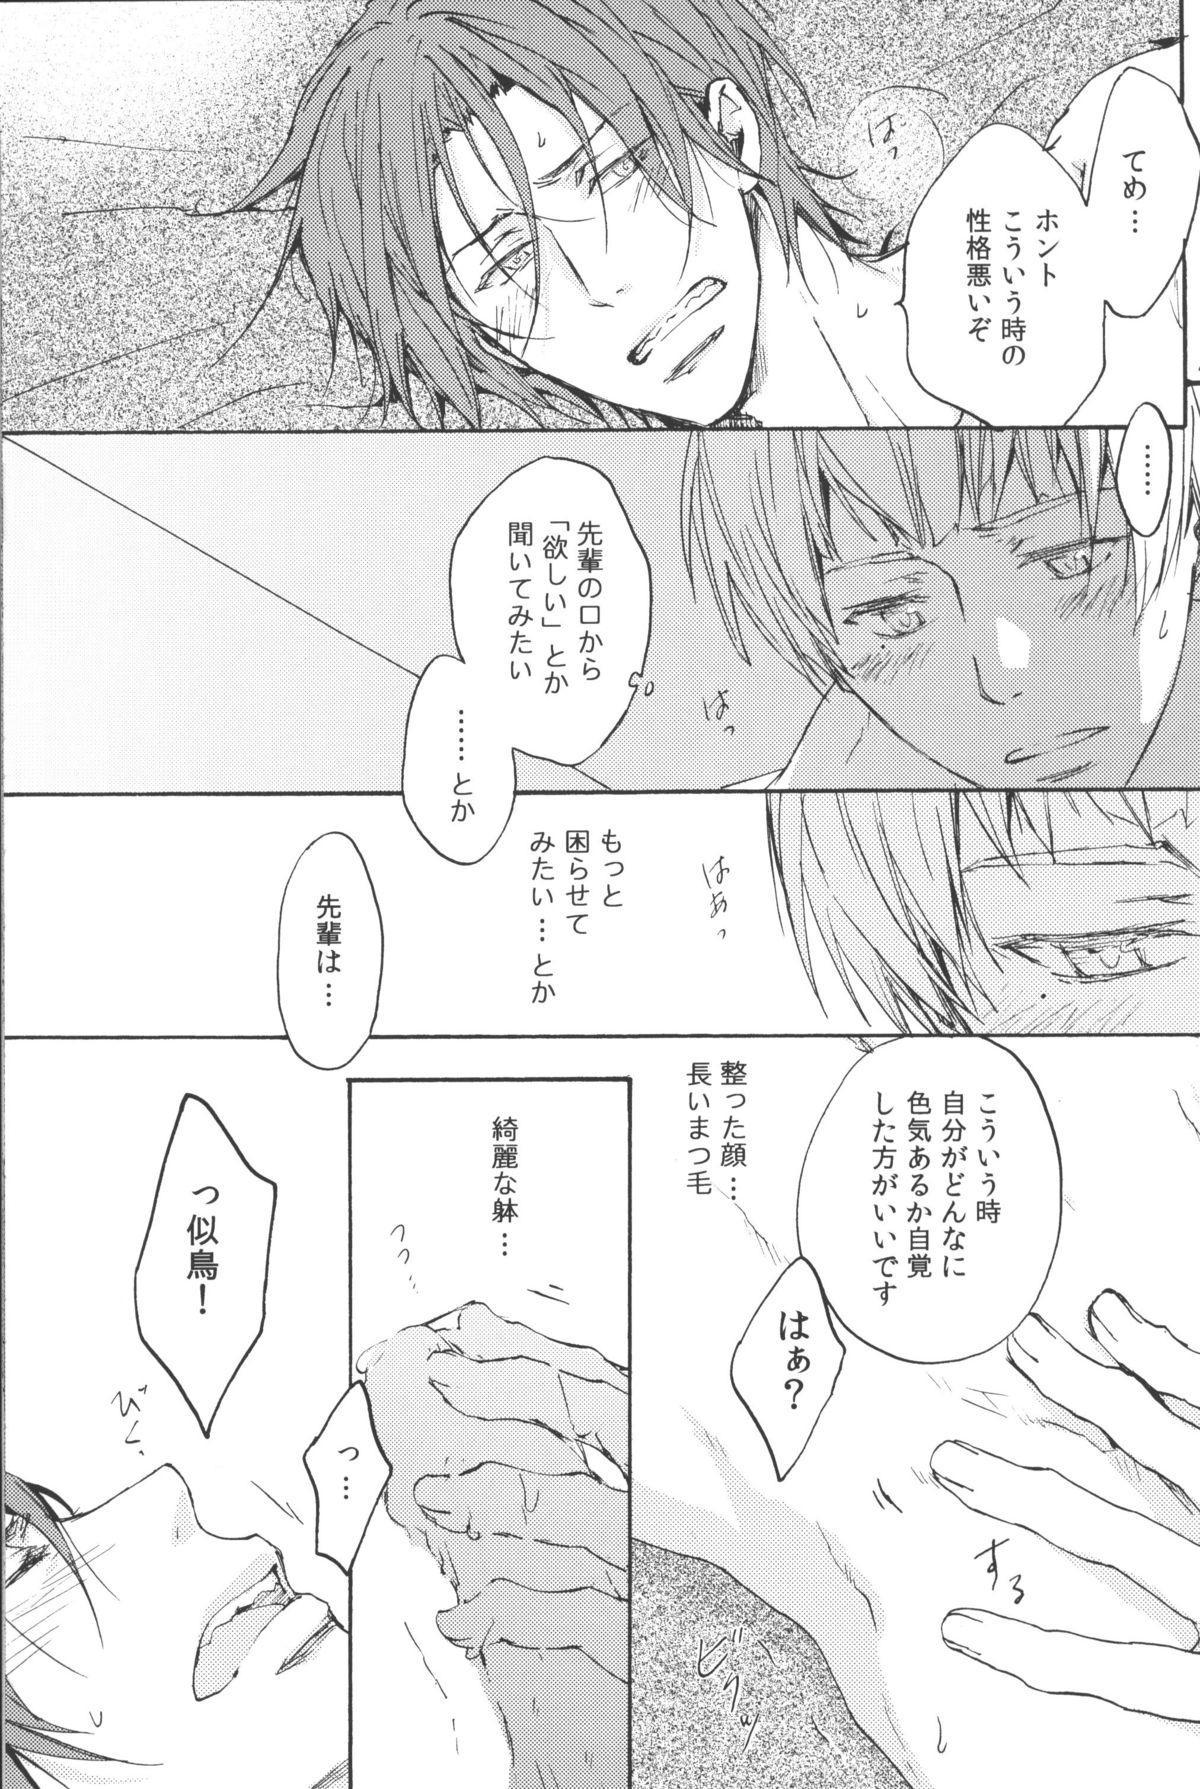 Ao to ka Aka to ka Kuro to ka 9